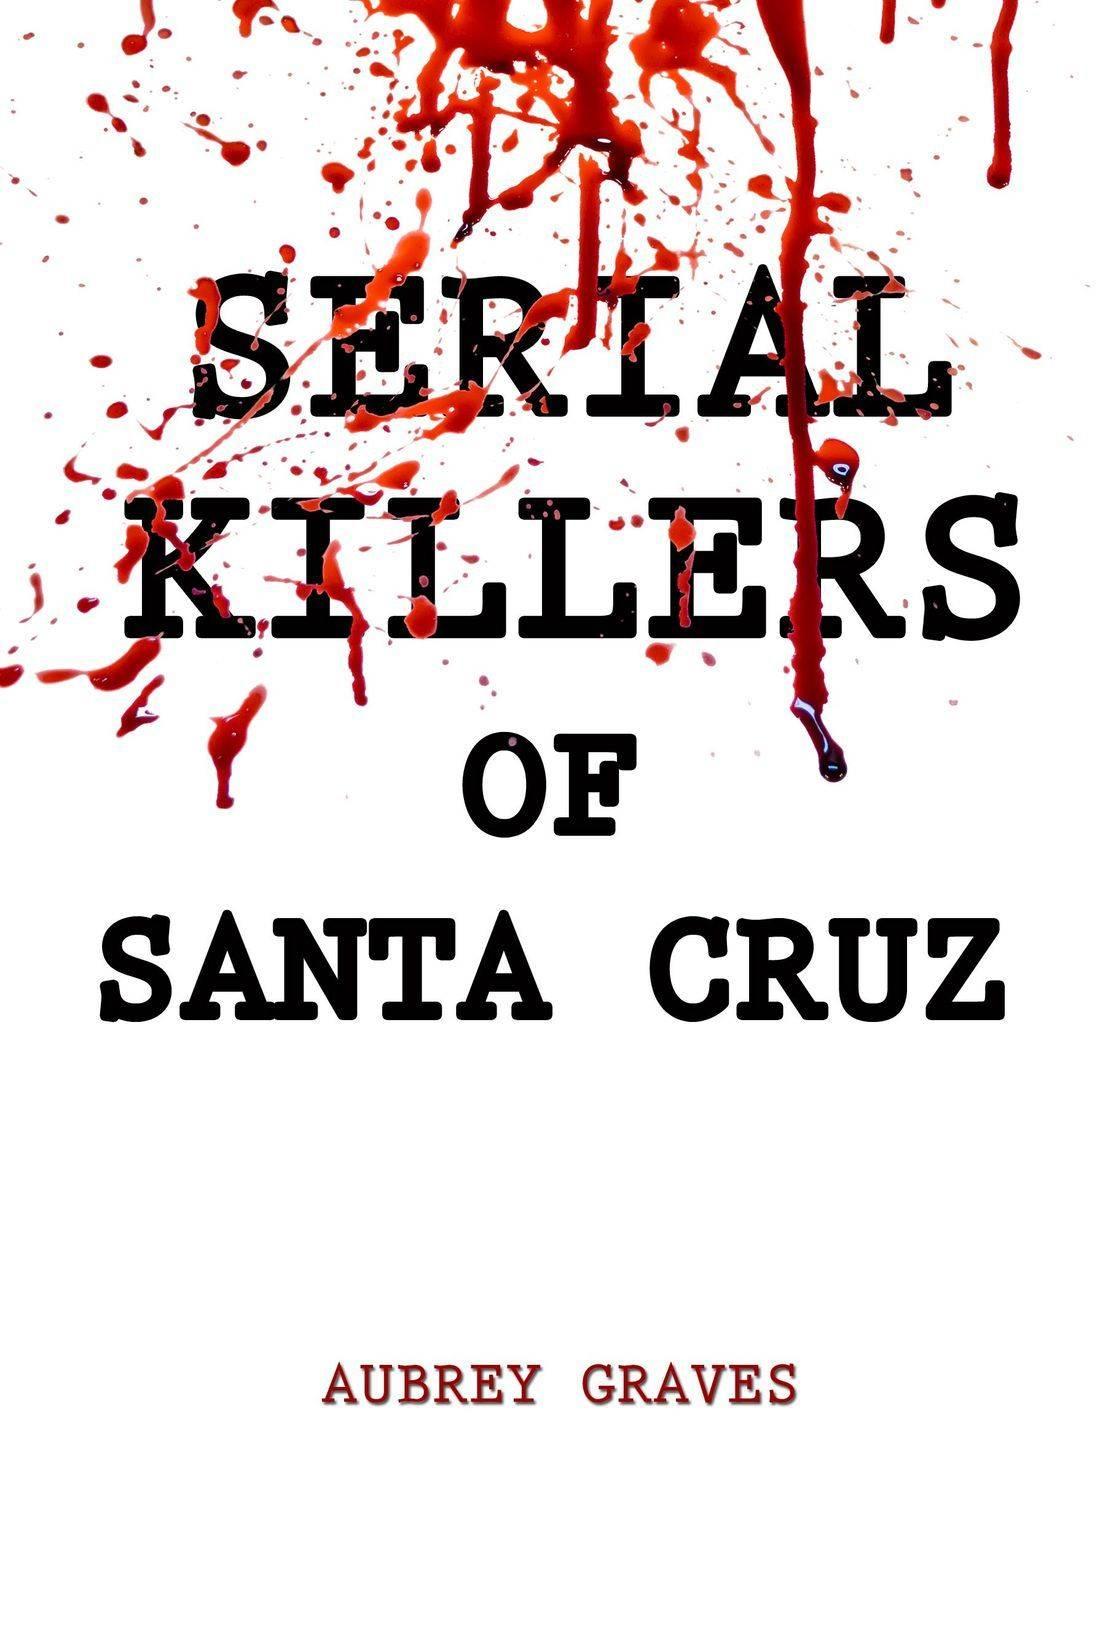 Serial Killers of Santa Cruz, mass murderers, killers, murder capital